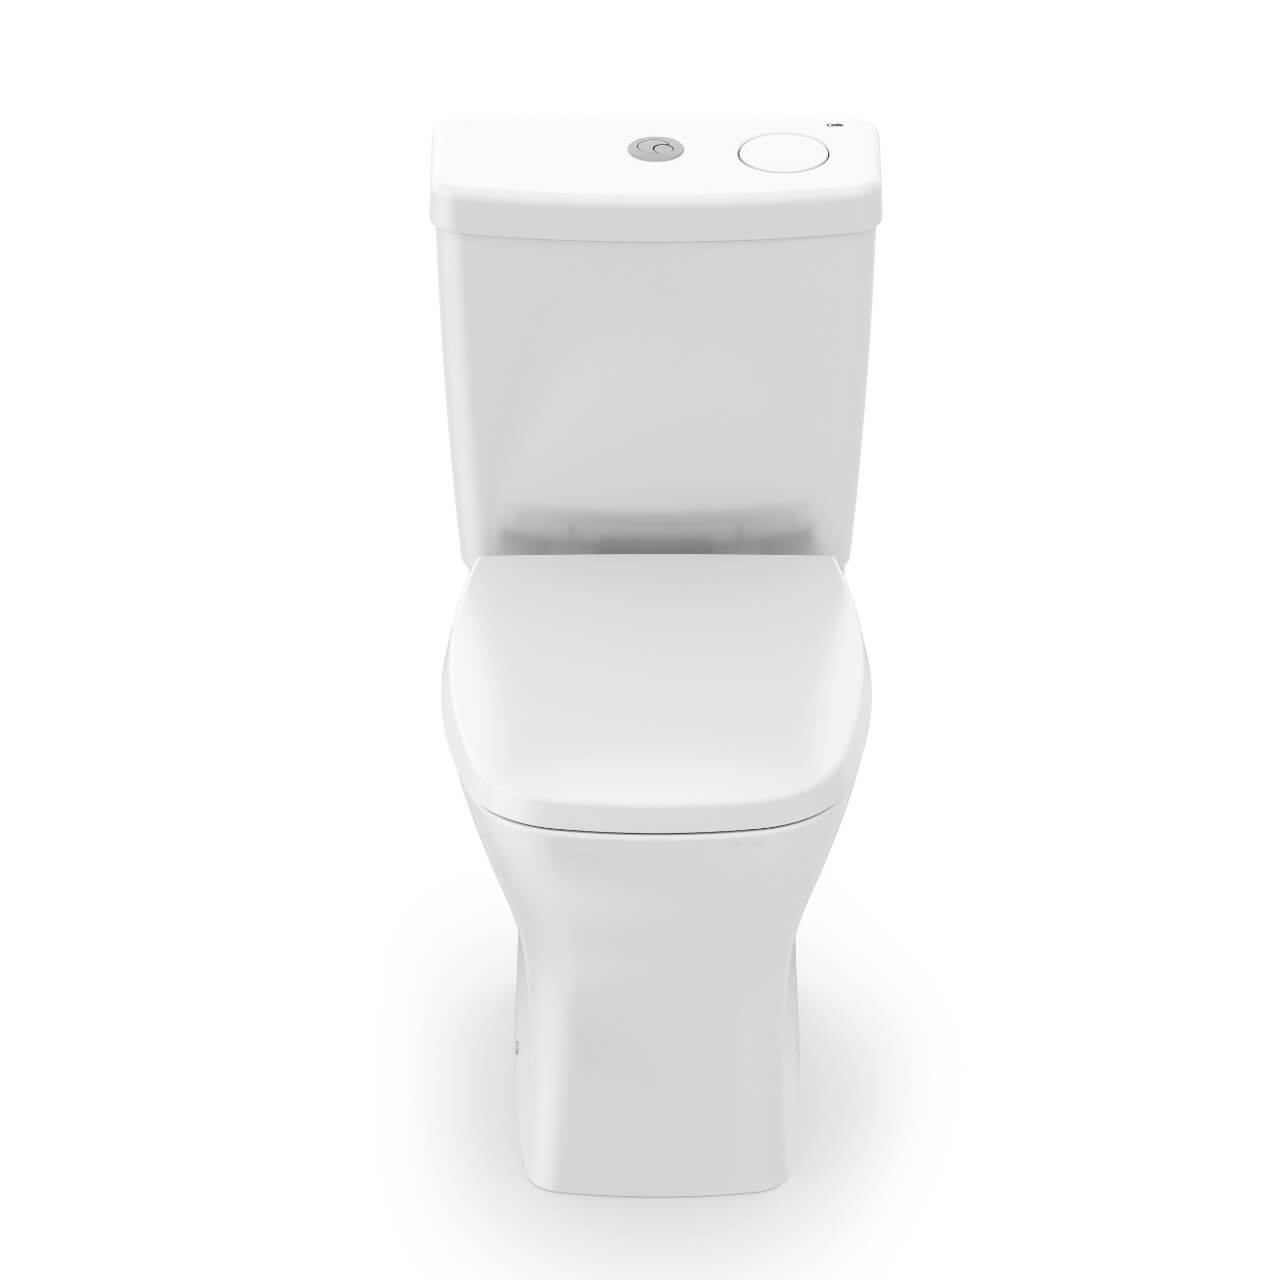 Kit Celite Vaso Sanitário com Caixa Acoplada Vip Branco  - Casa Mattos